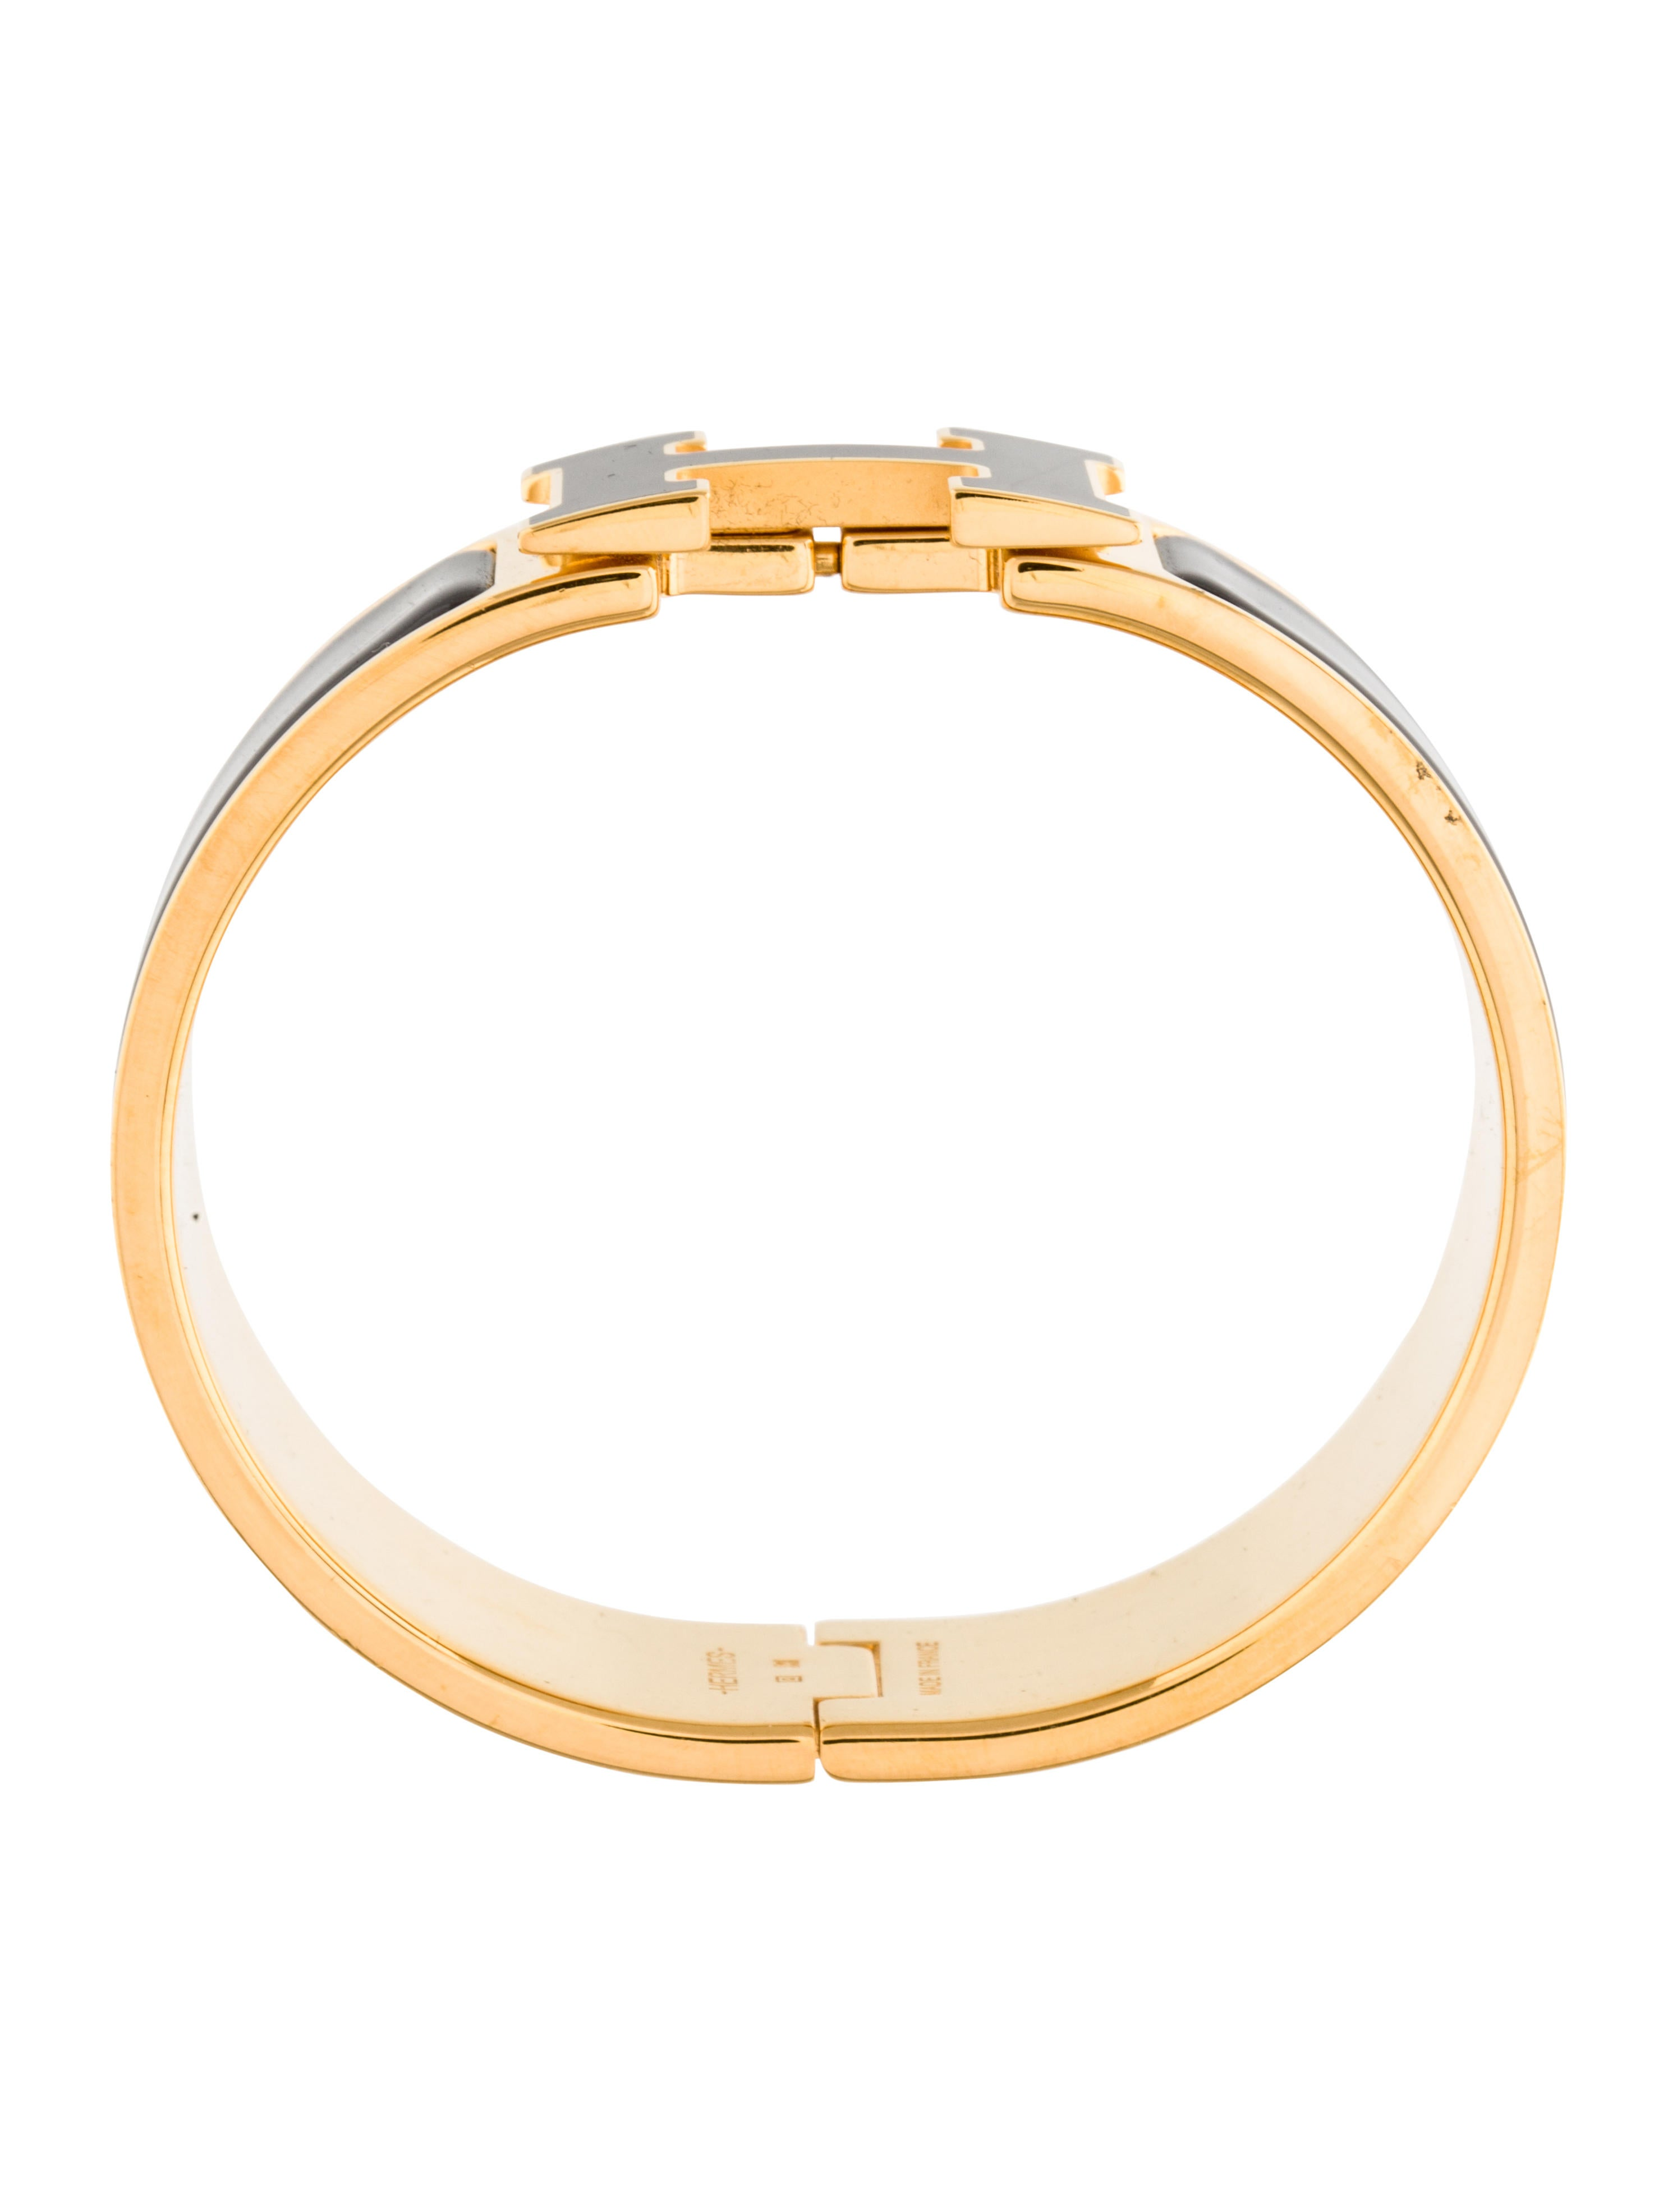 herm 232 s clic clac h bracelet bracelets her91606 the realreal